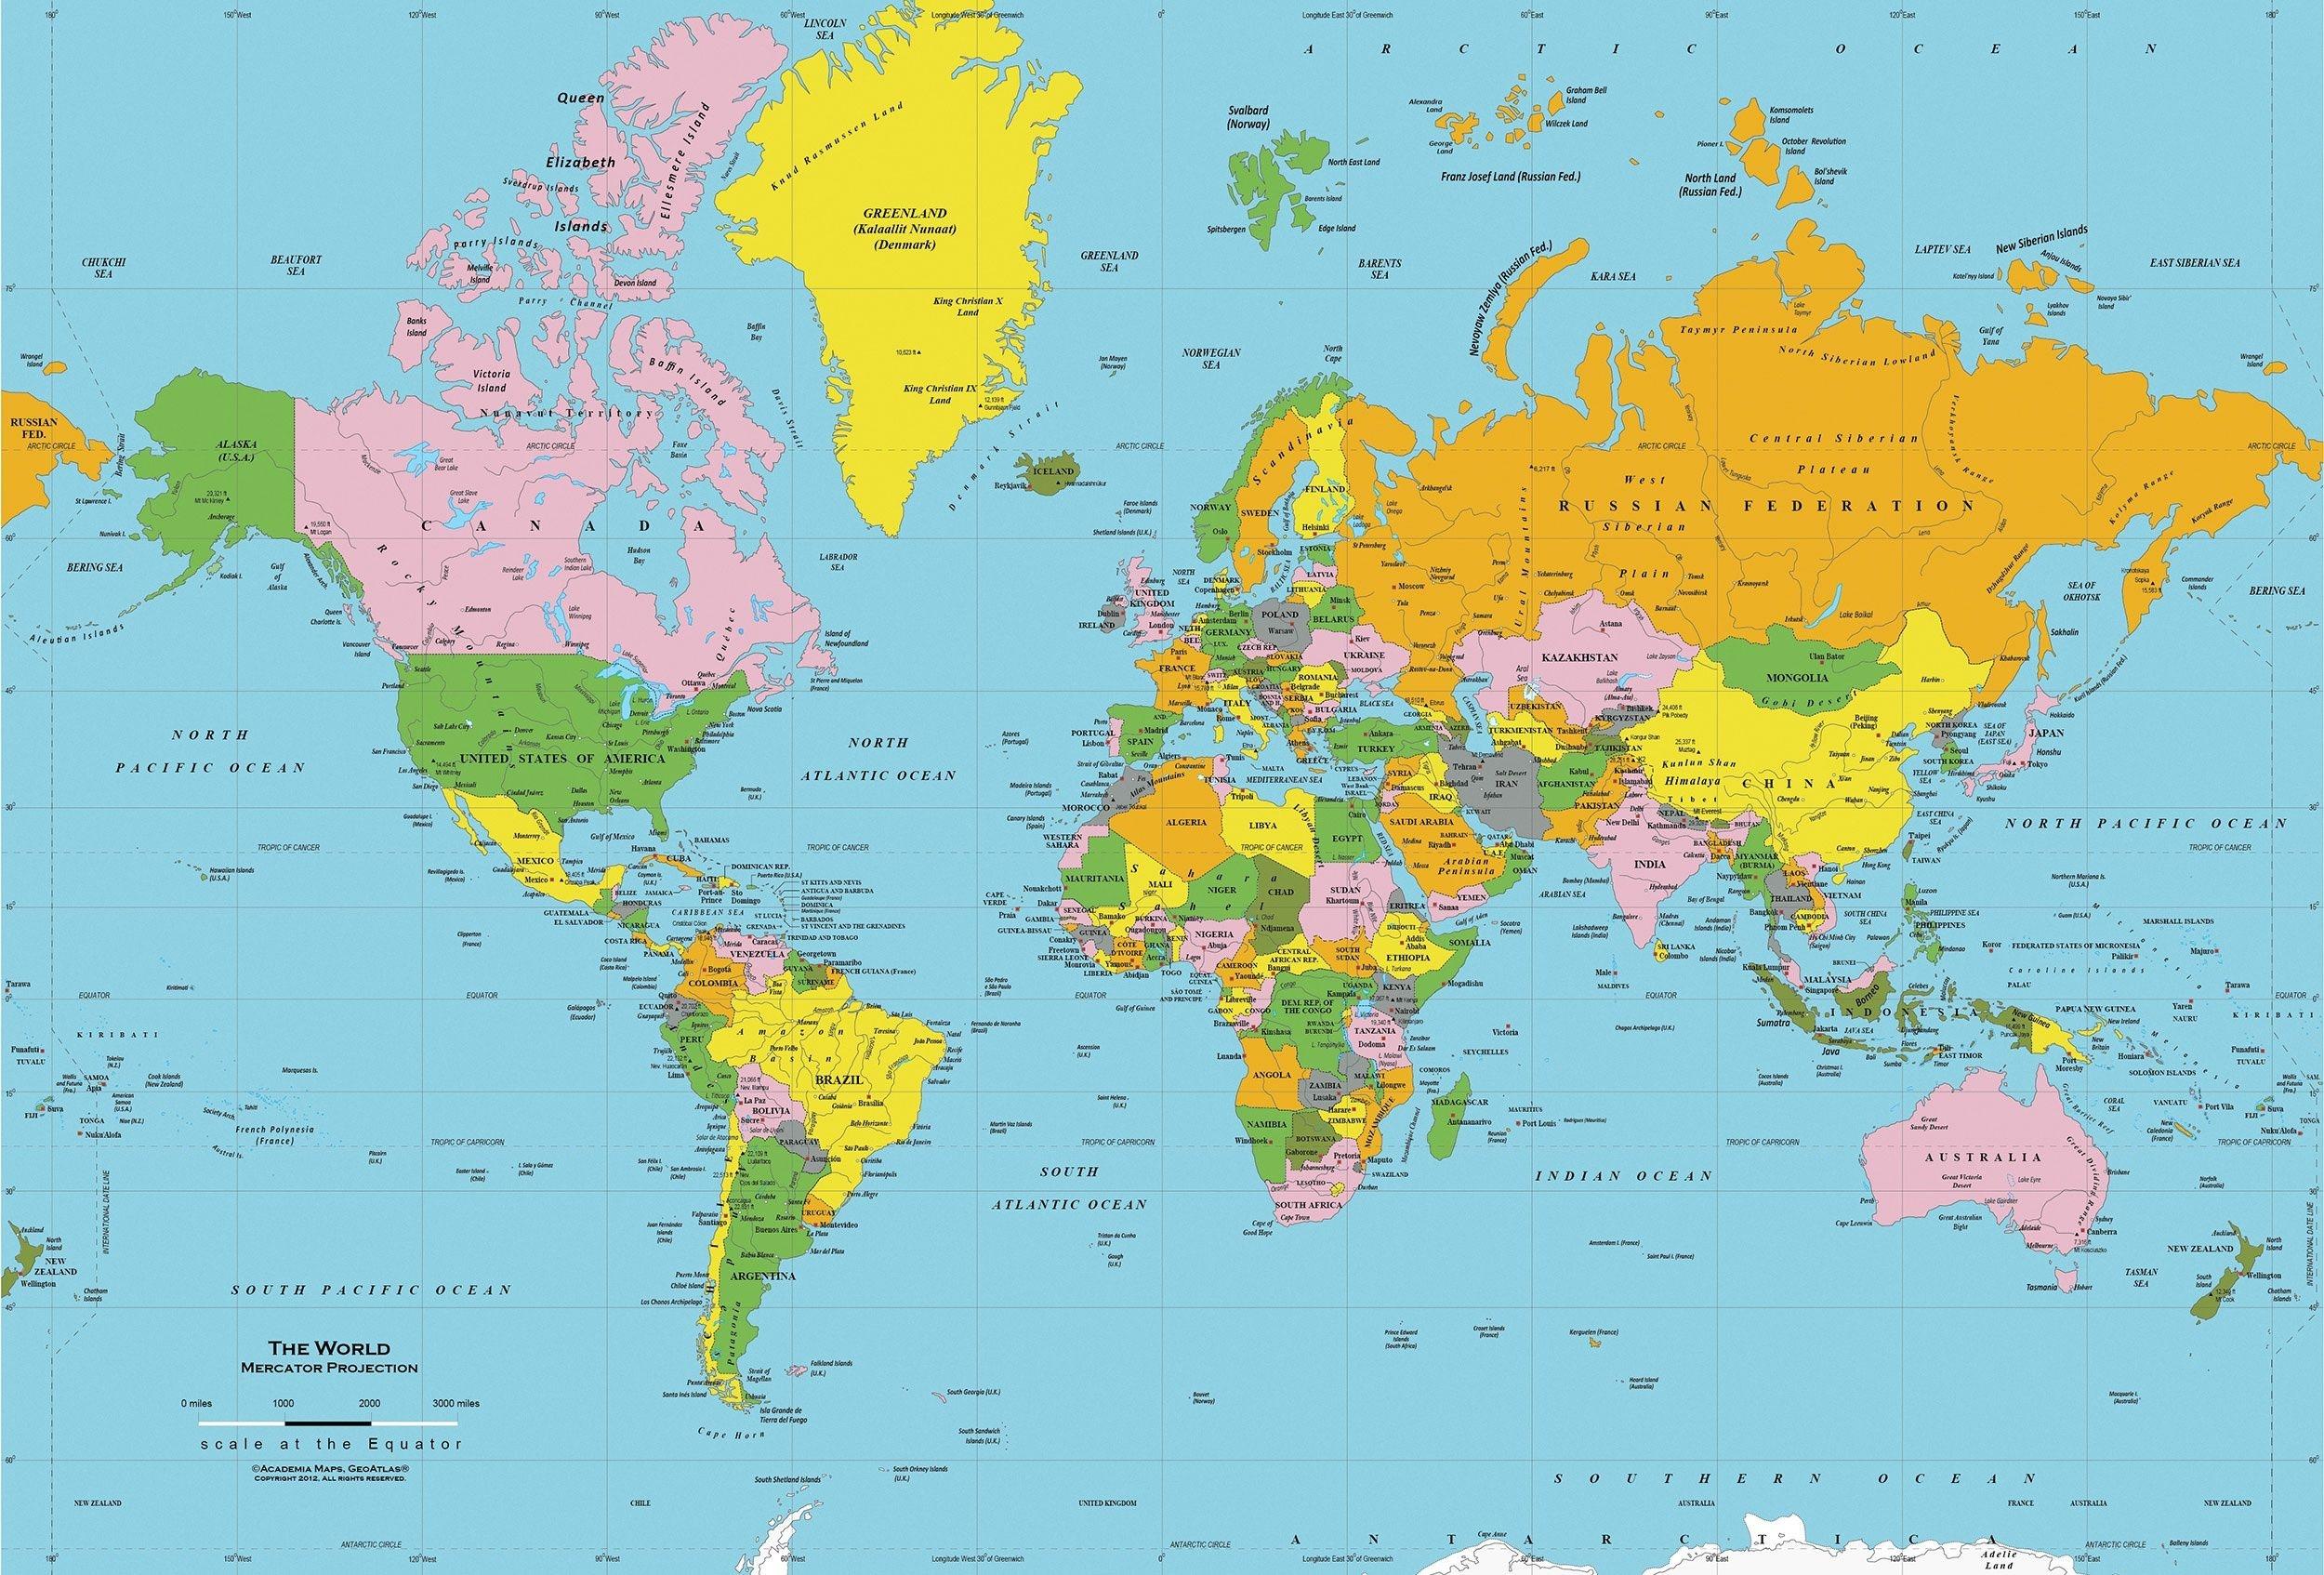 Printable World Map Free | Sitedesignco - Free Printable World Map